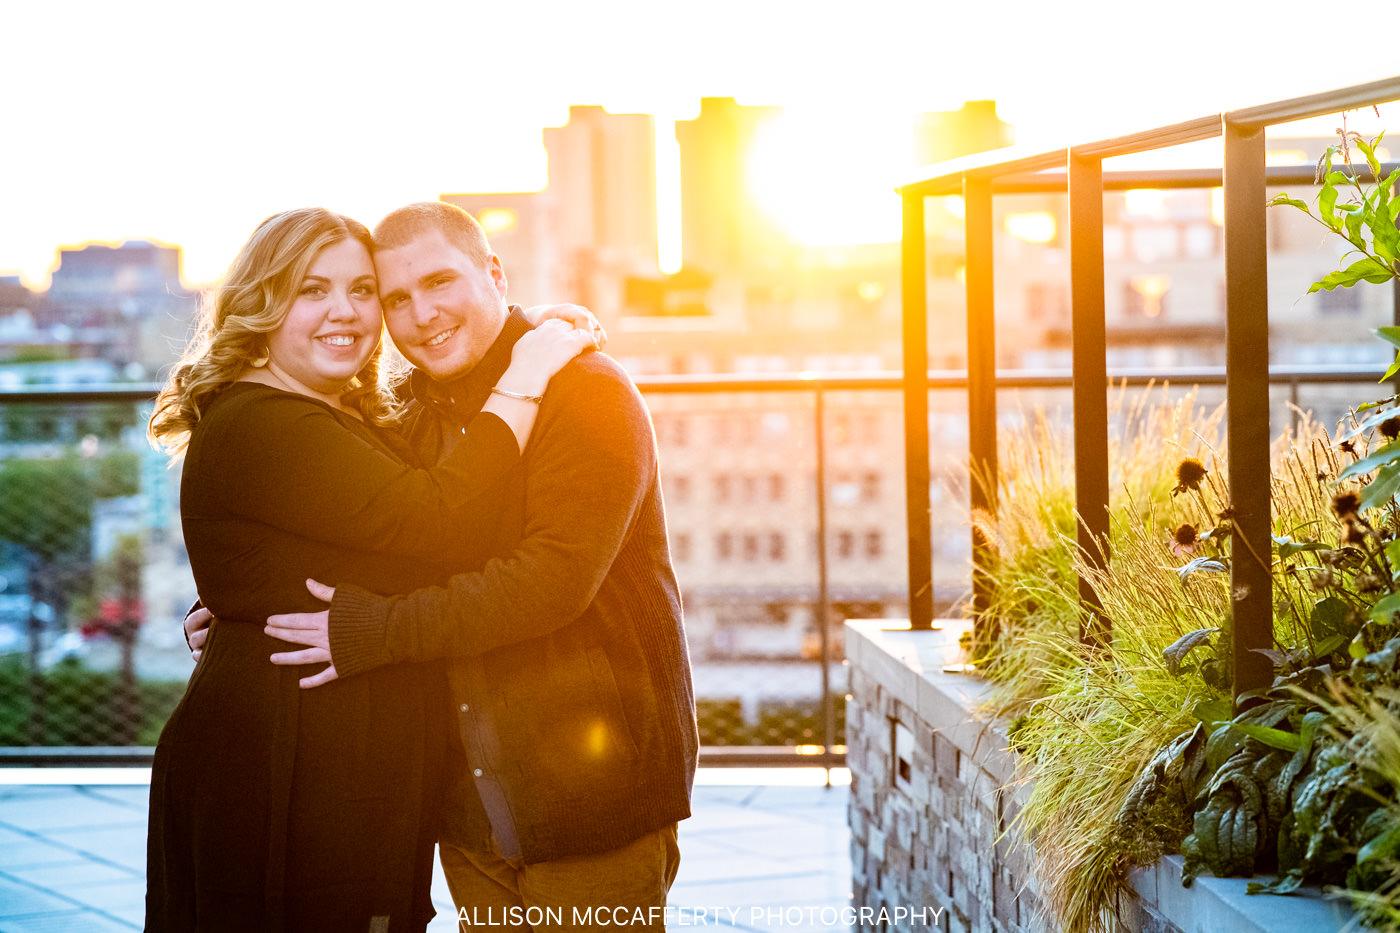 Cira Green Engagement Photos